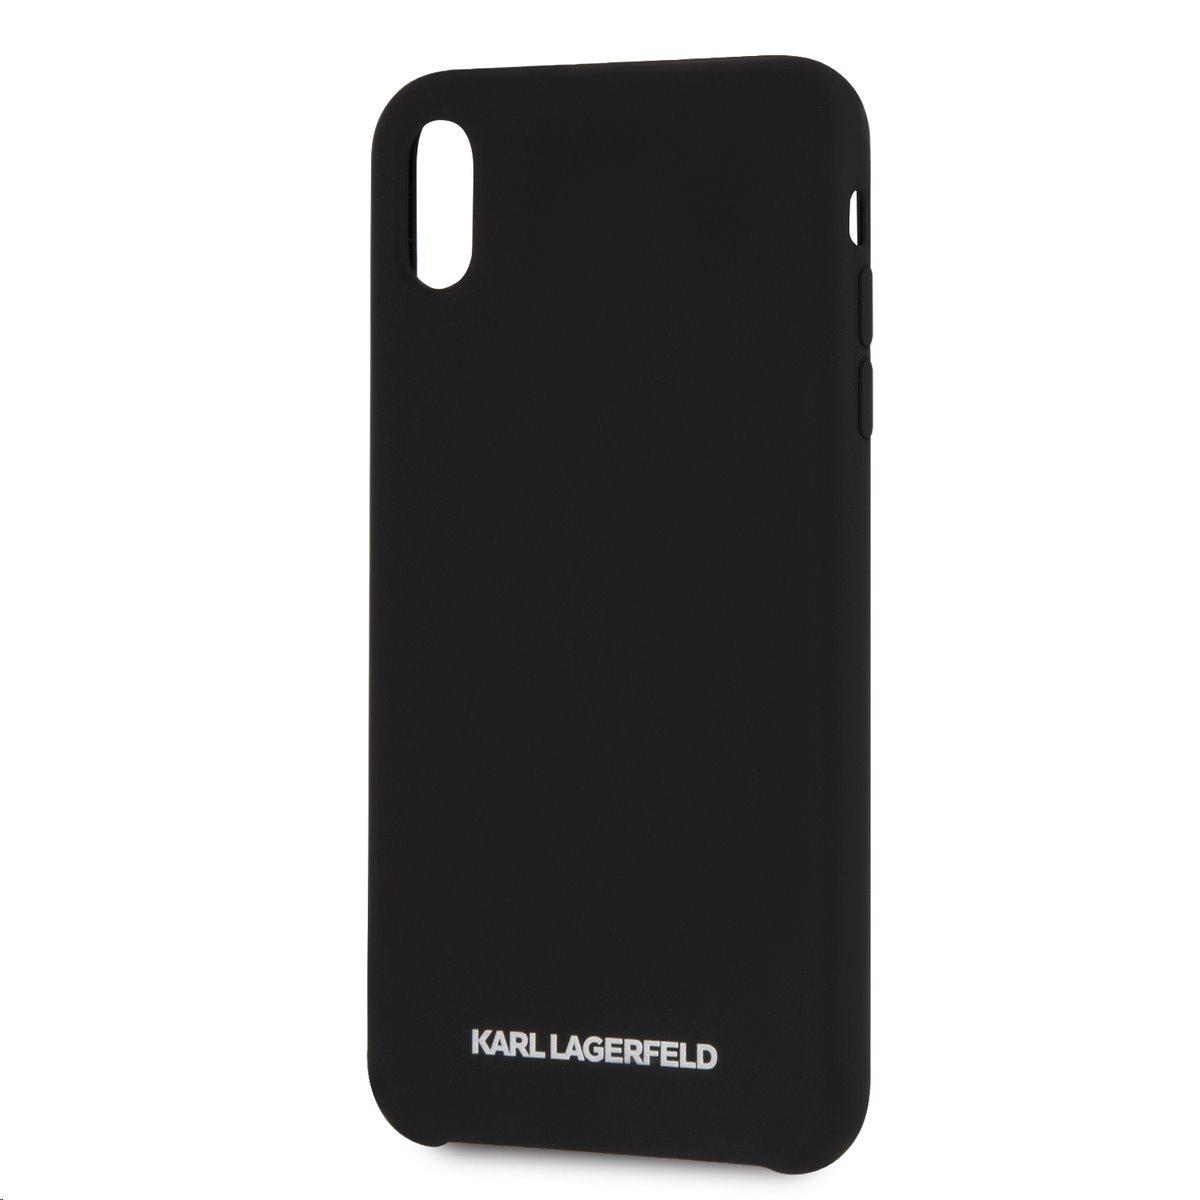 Silikonové pouzdro Karl Lagerfeld Silver Logo Silicone Case na iPhone XS Max,black